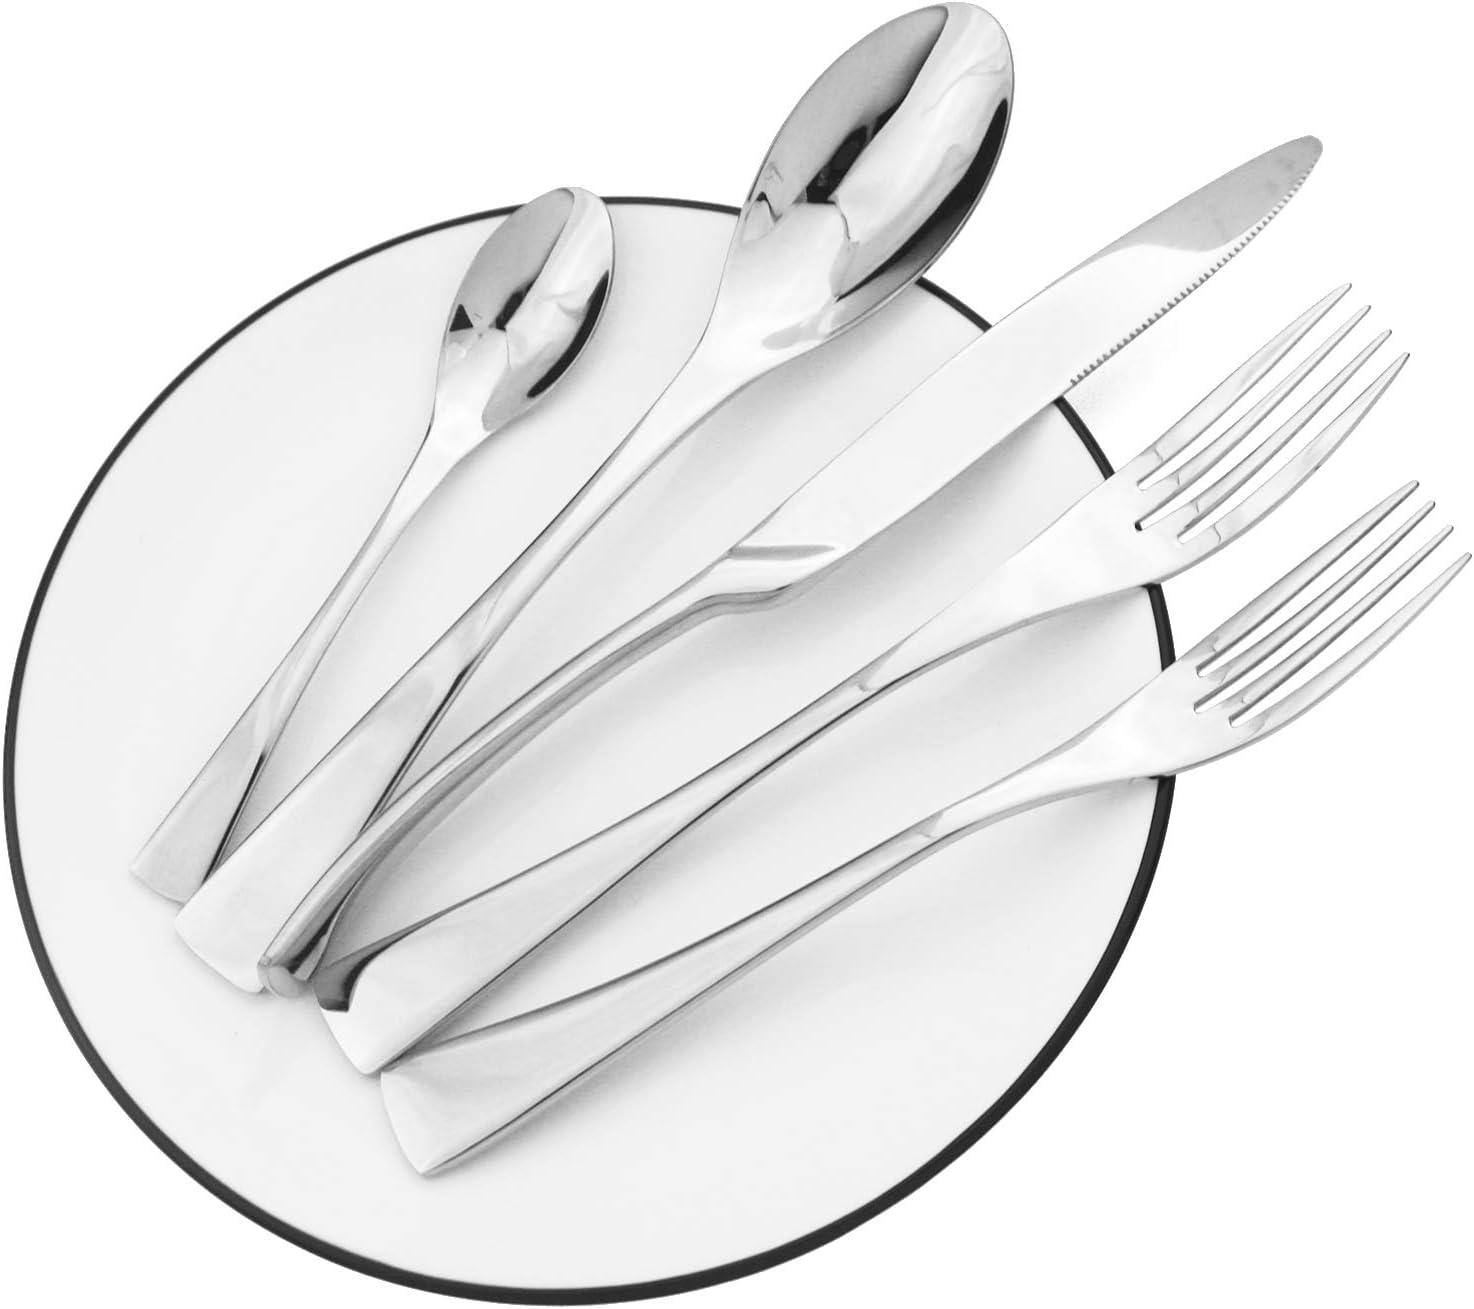 BRIIEC 20-Piece Flatware OFFicial Silverware Set Inexpensive Stainless Steel 18 10 Ea